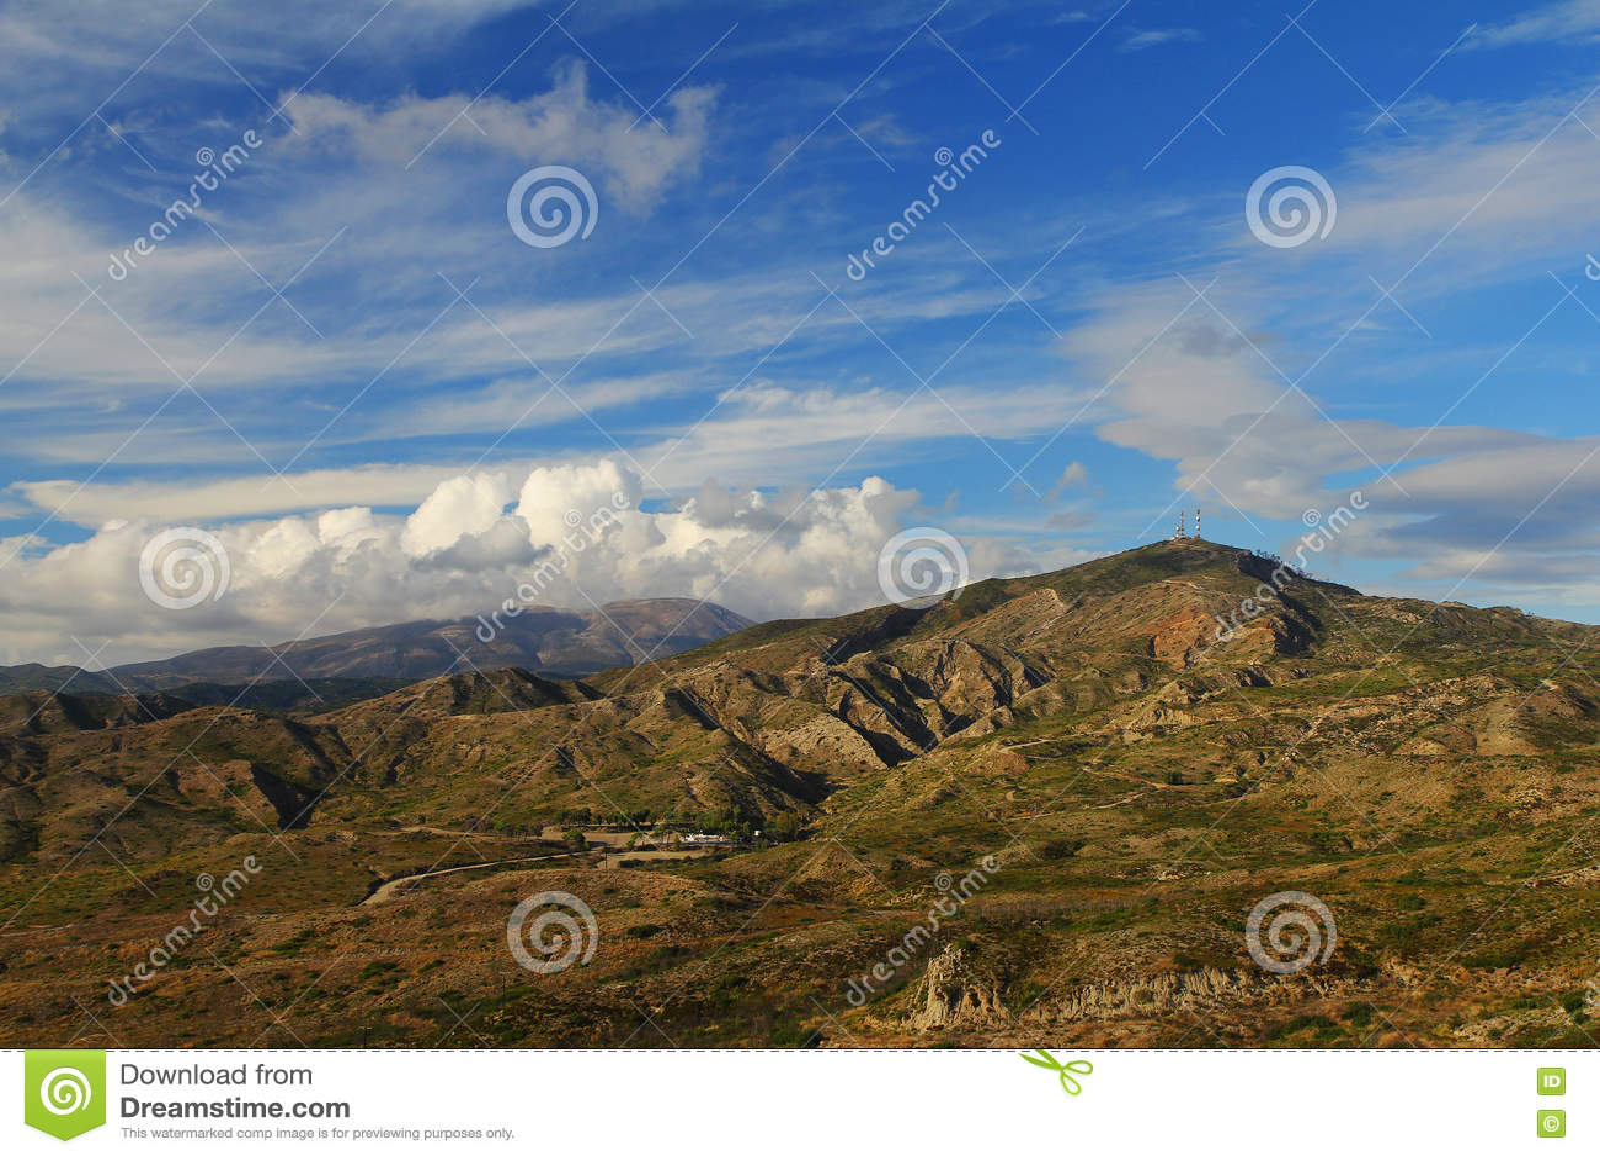 Mountains on Rhodes (Greece)